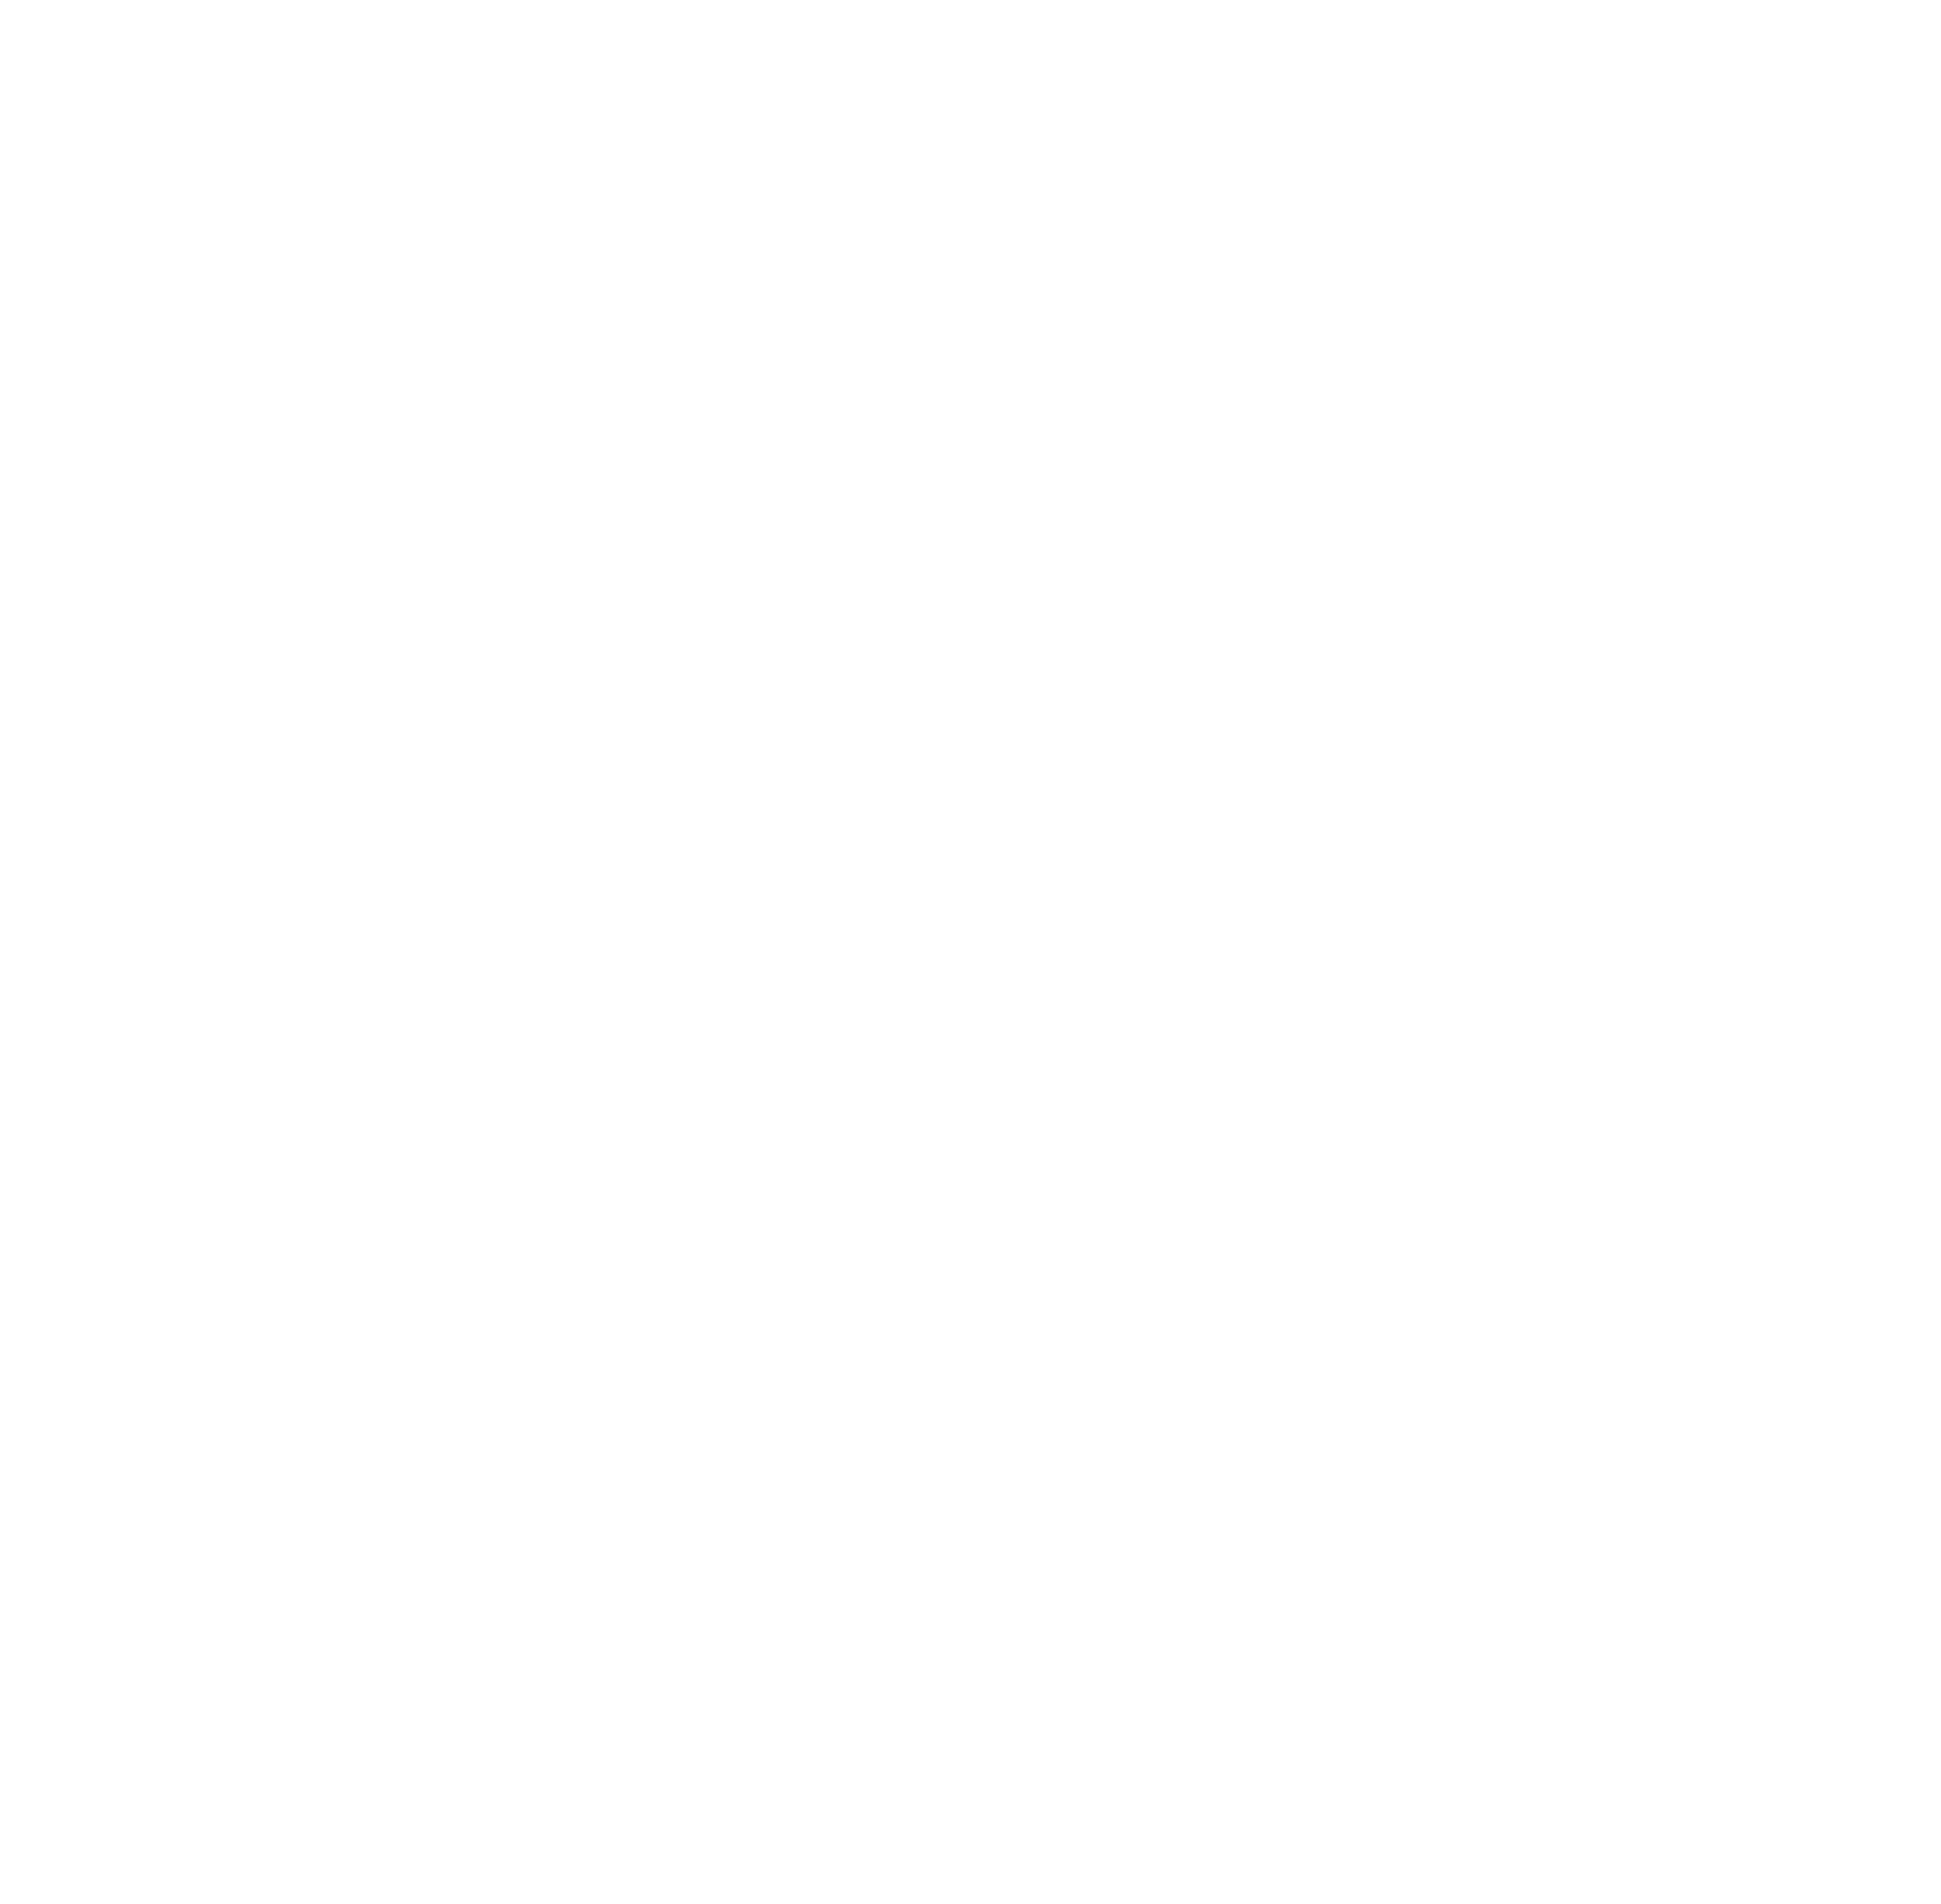 Zone-5a-white